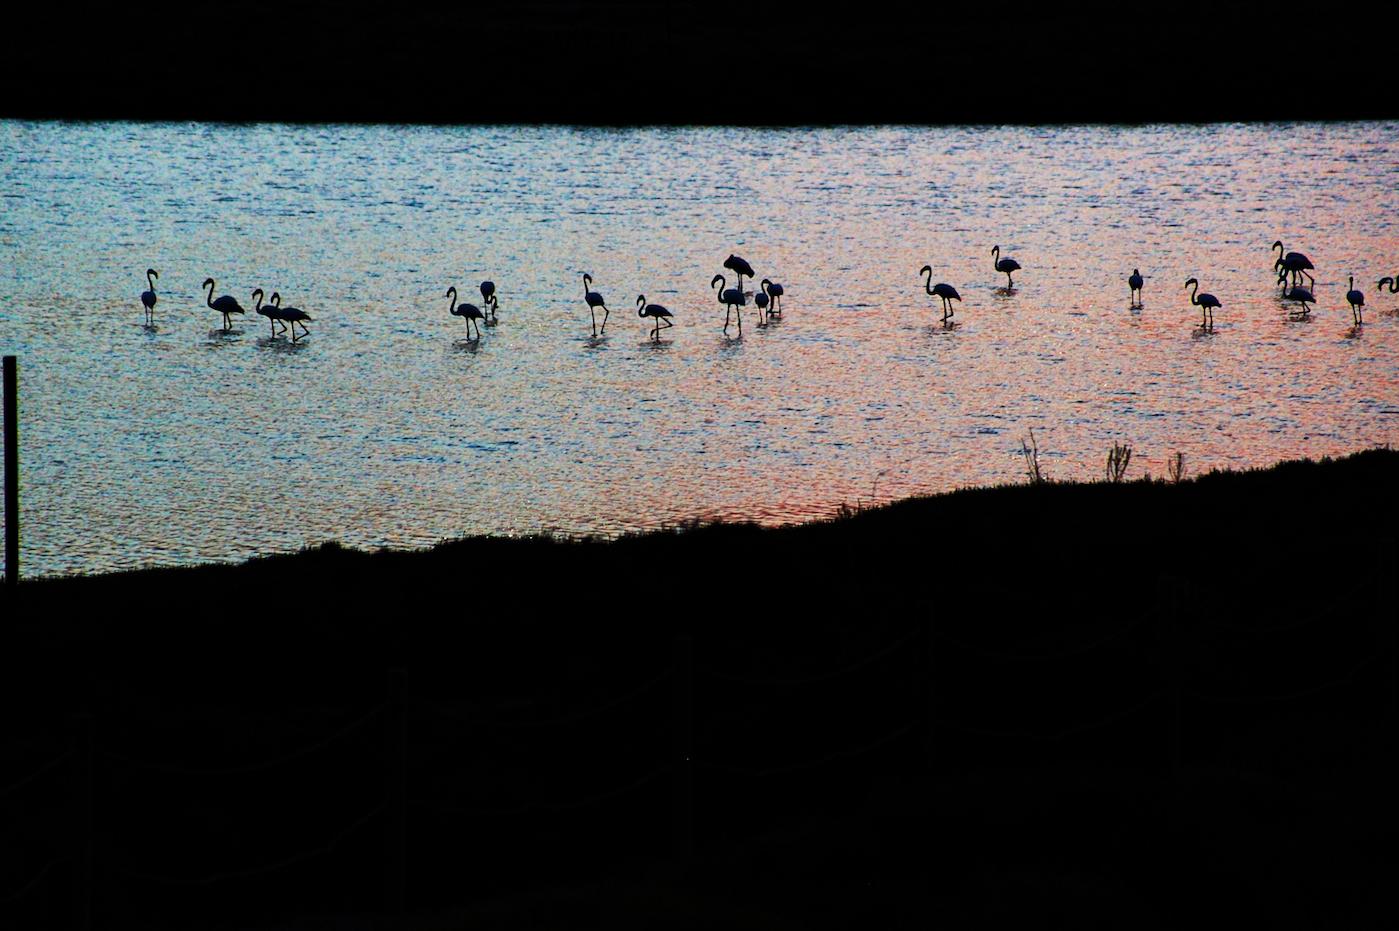 https://www.white-ibiza.com/wp-content/uploads/2020/03/white-ibiza-sunsets-coricancha-2020-01.jpg